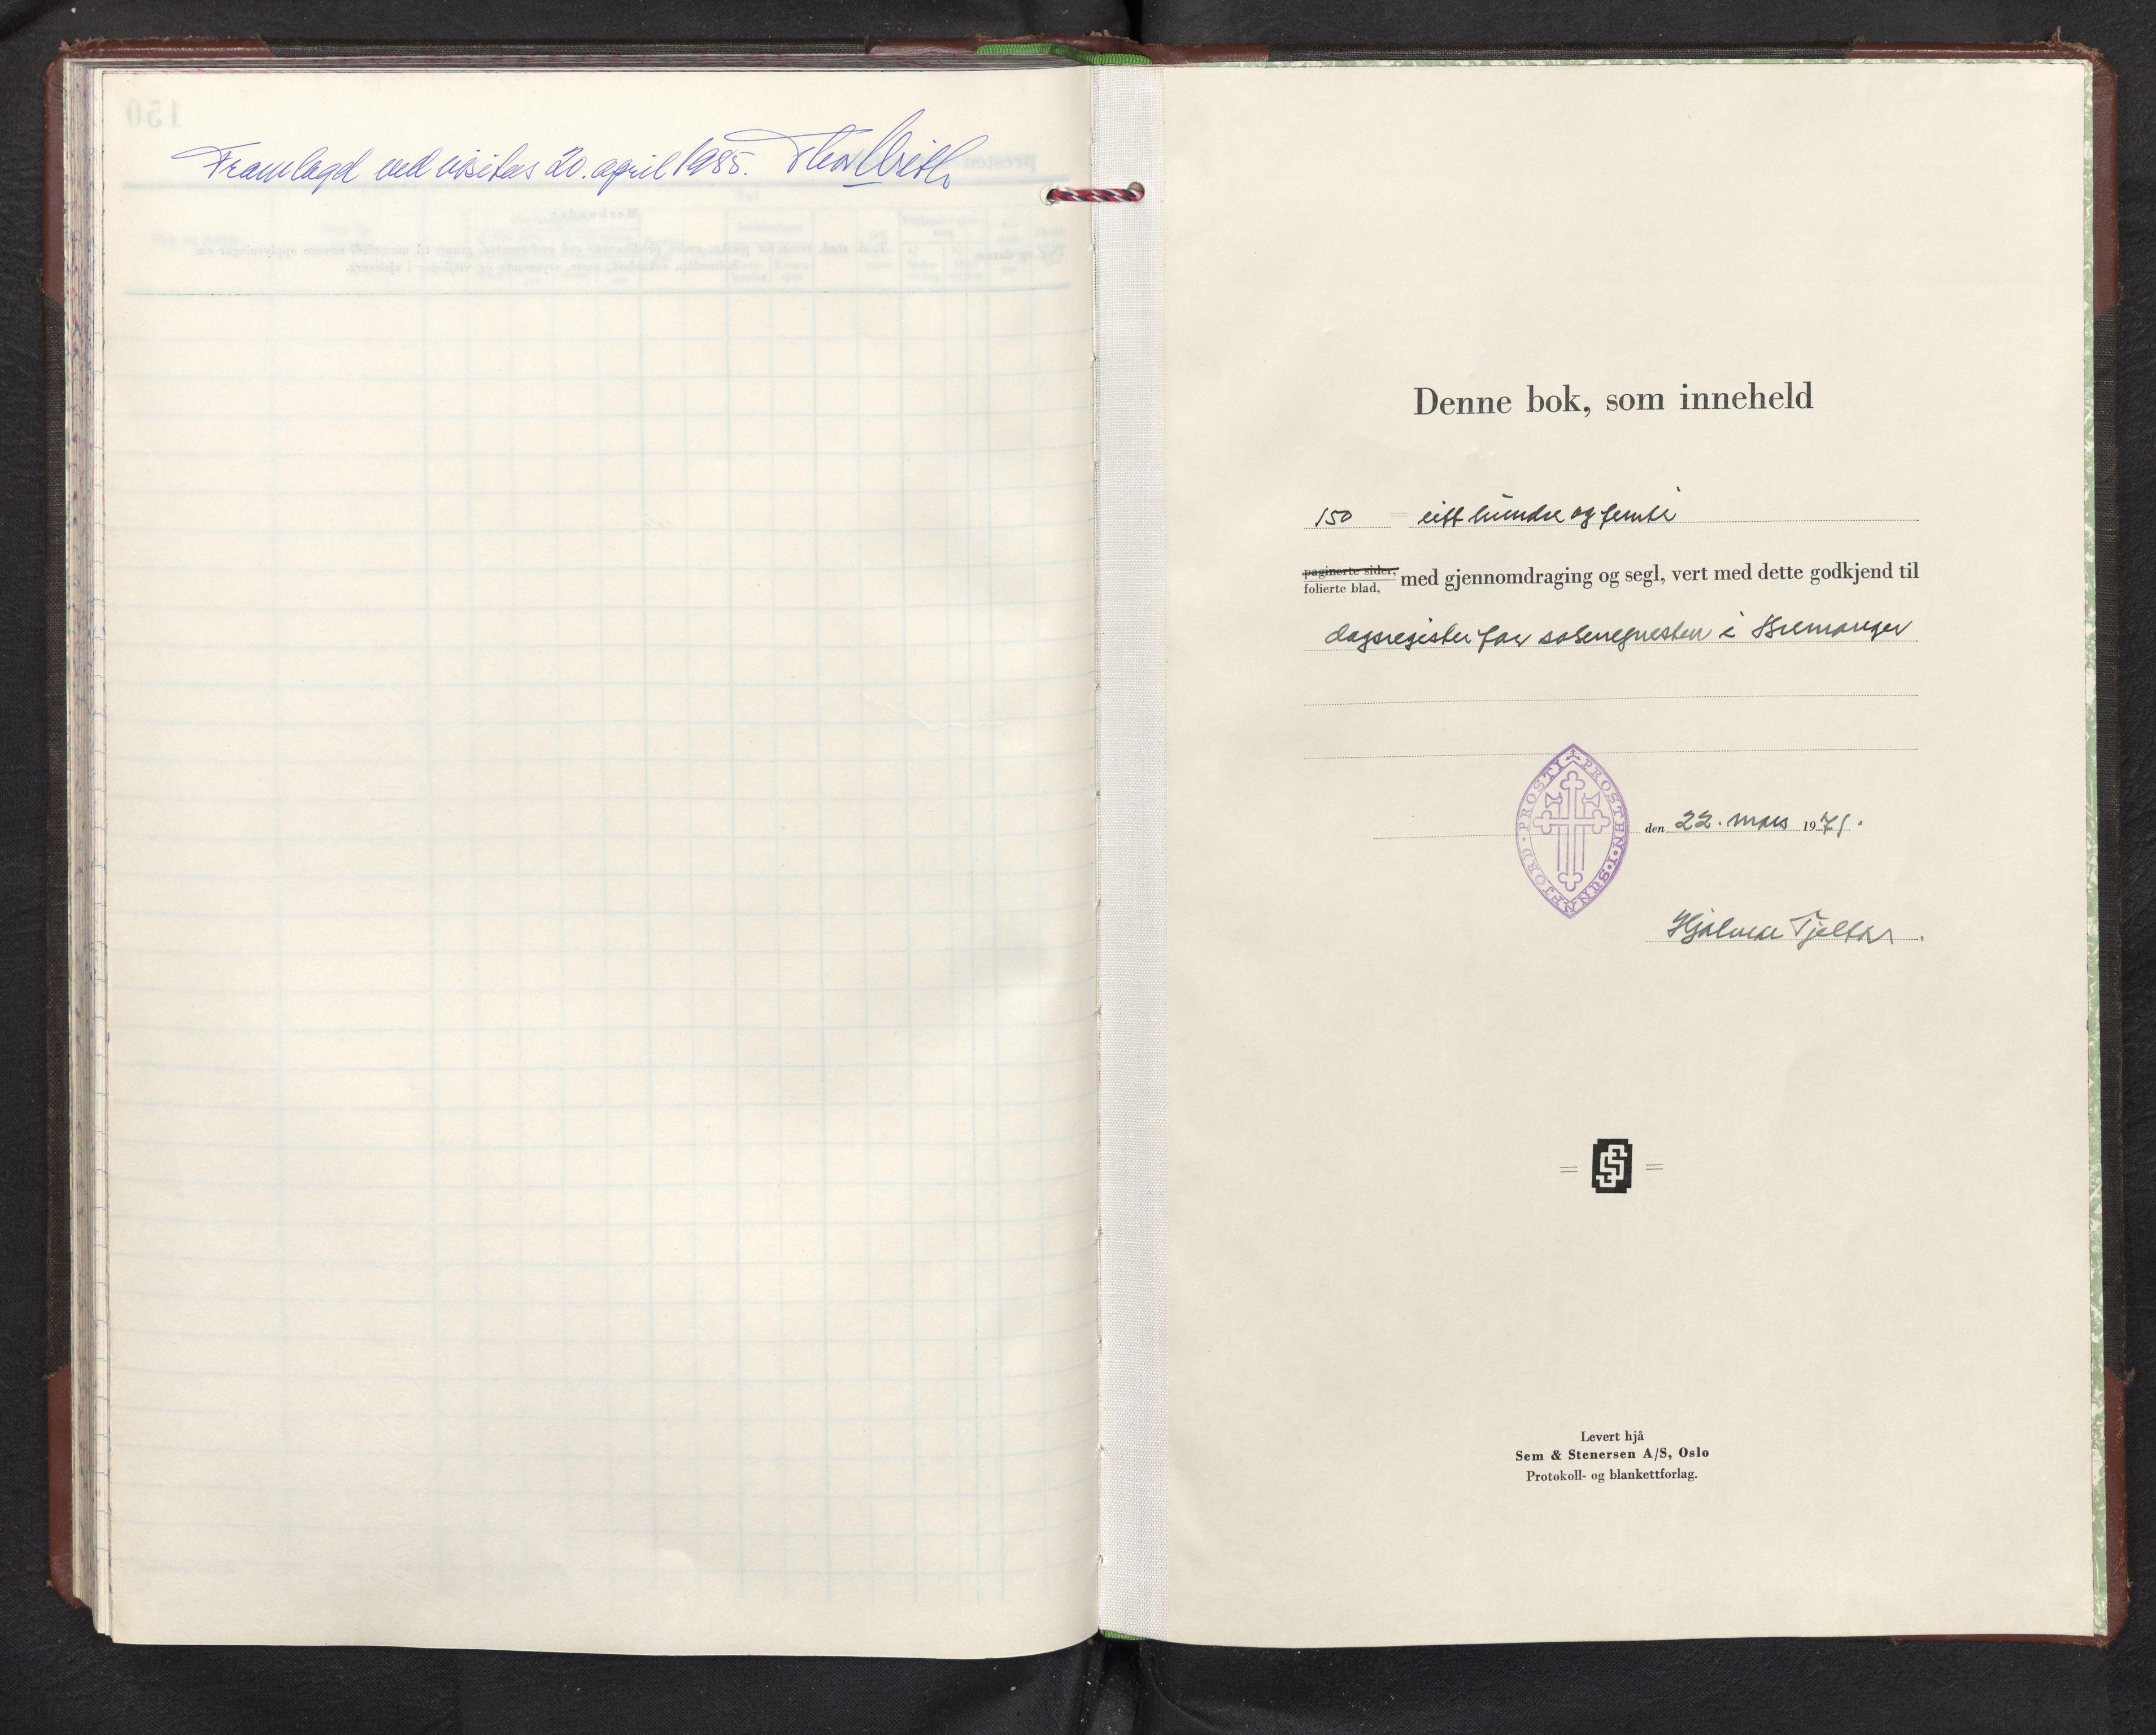 SAB, Bremanger Sokneprestembete, Dagregister nr. D 4, 1971-1982, s. 143b-144a